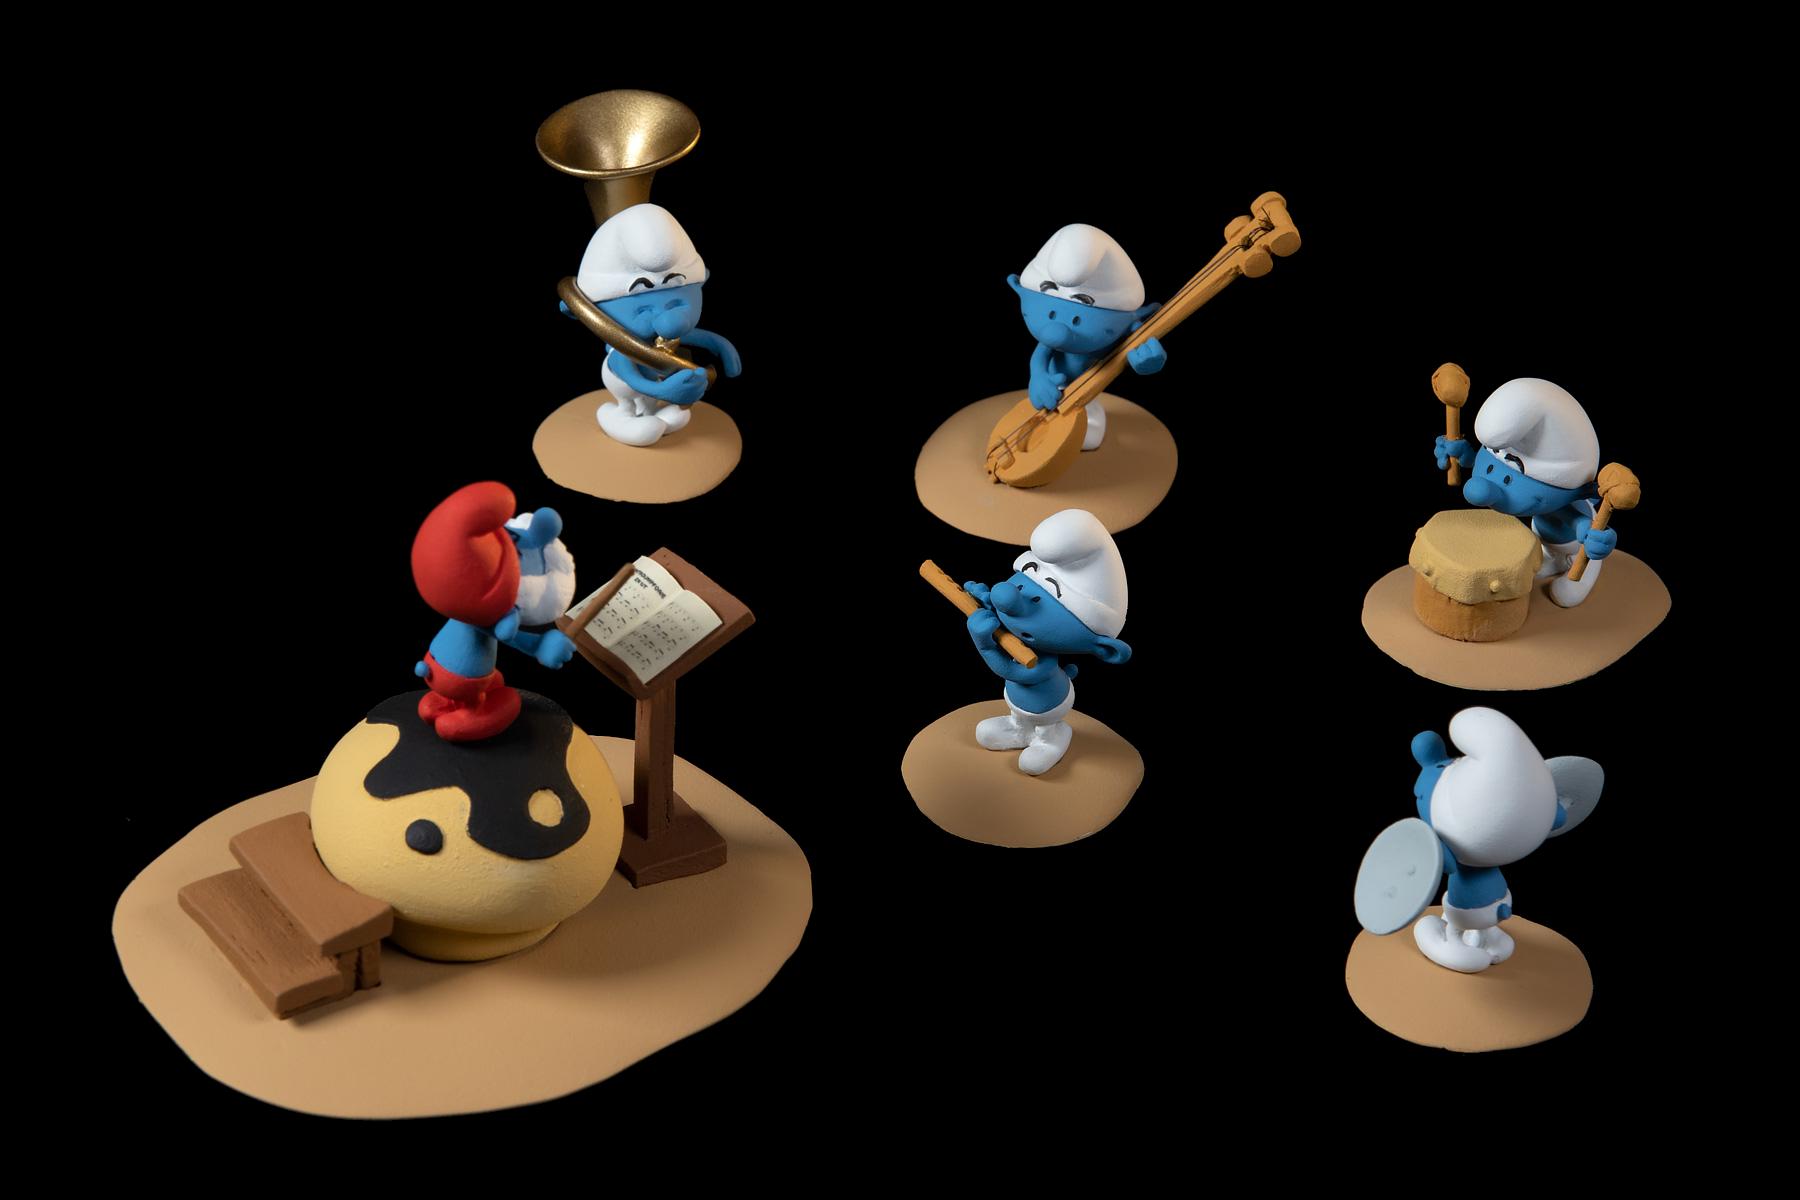 fariboles-smurfs-orchestra-part-1-toyslife